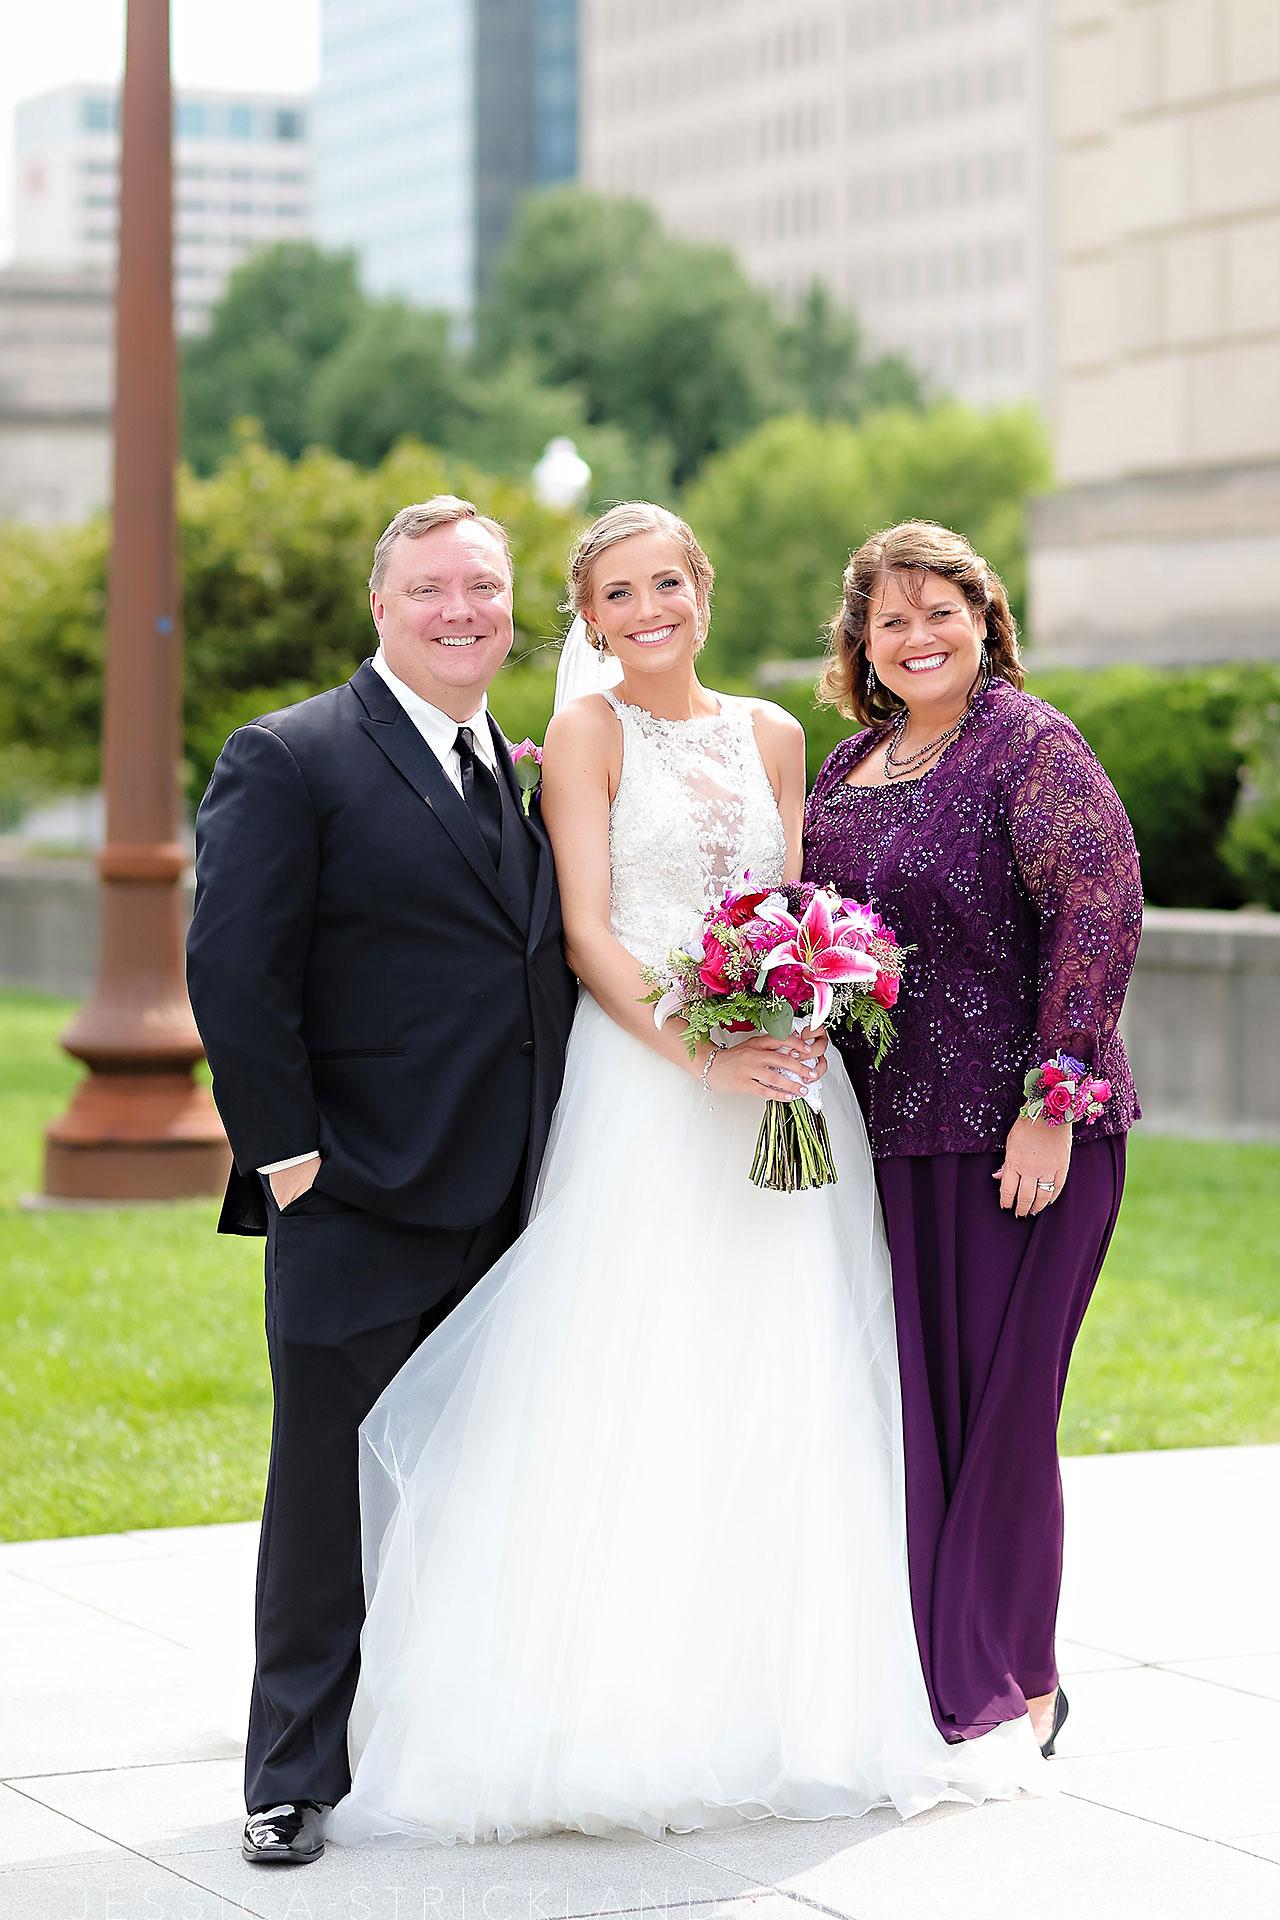 Serra Alex Regions Tower Indianapolis Wedding 110 watermarked